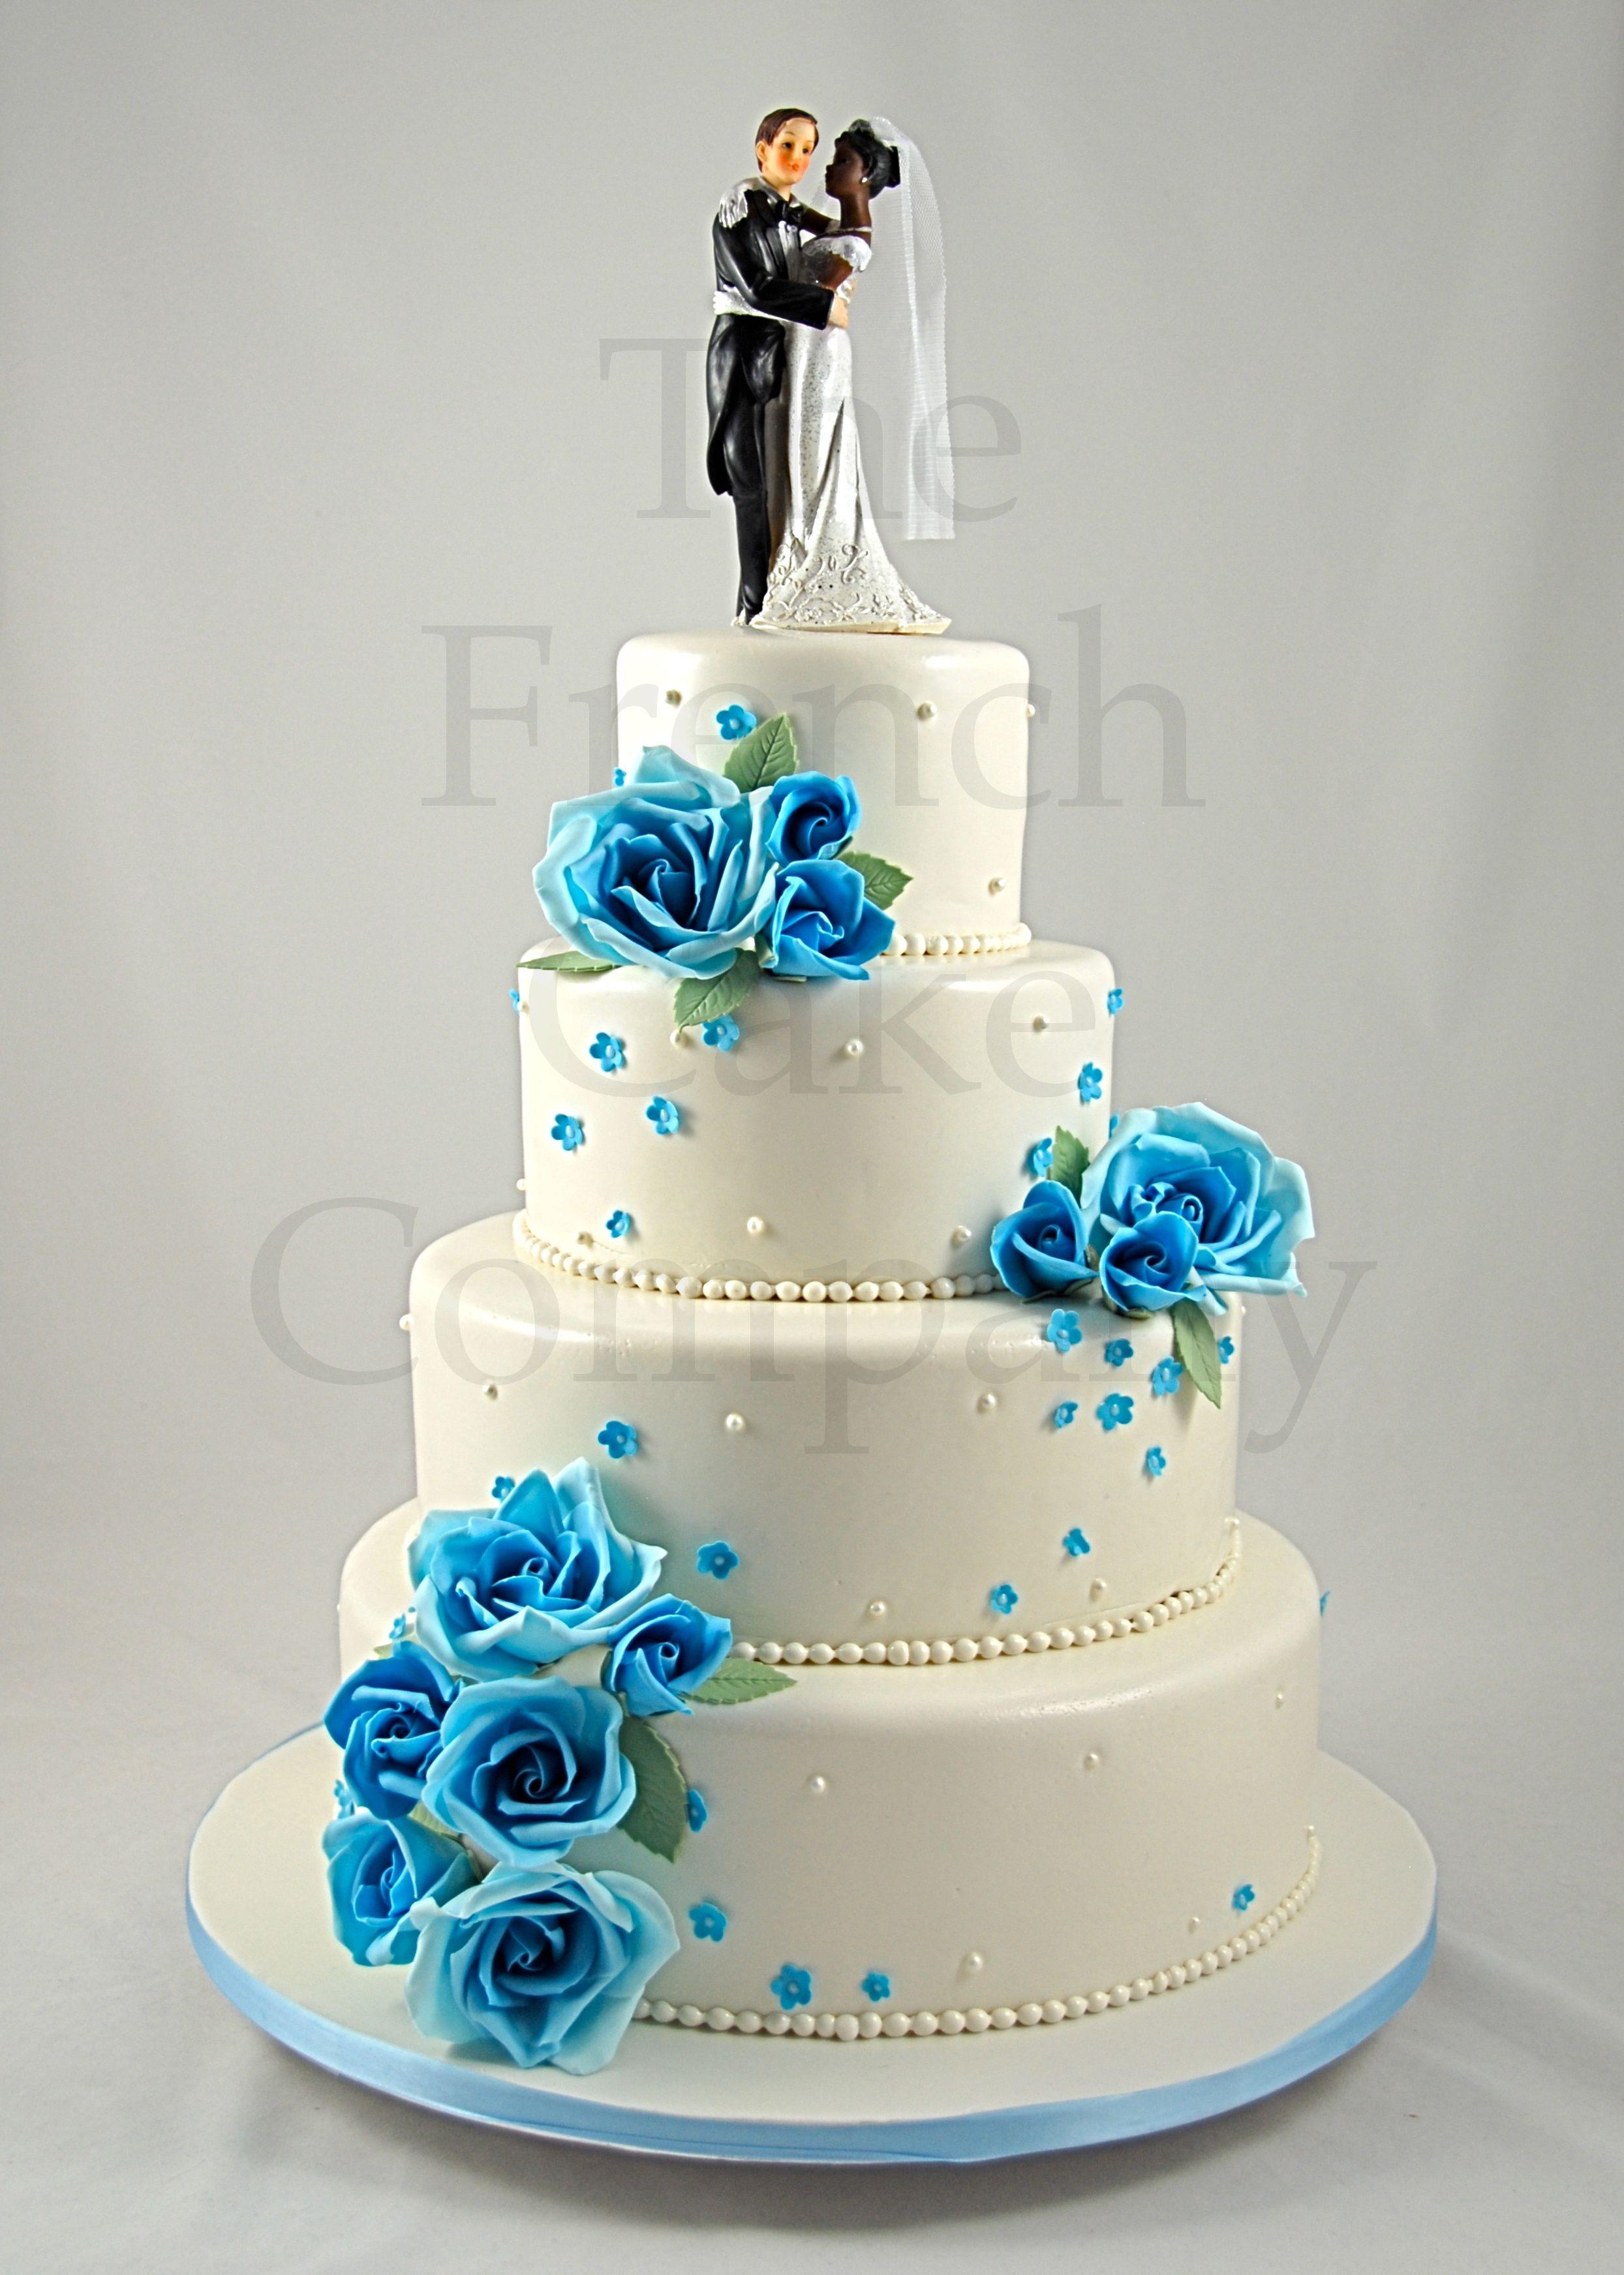 wedding cake blue flowers piece montee mariage fleurs. Black Bedroom Furniture Sets. Home Design Ideas